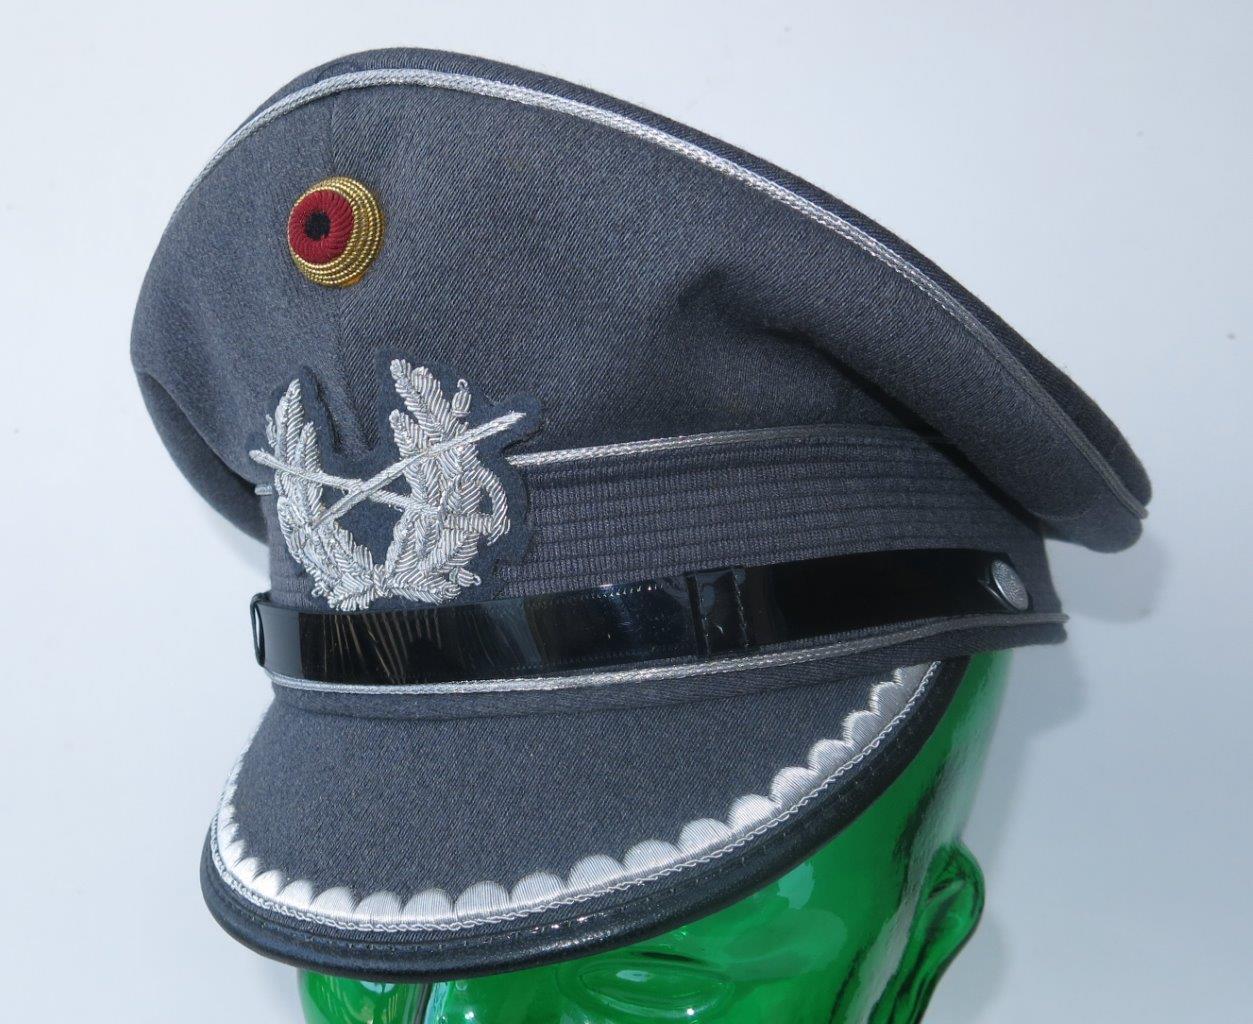 Current Bundesheer Officer Visor Cap